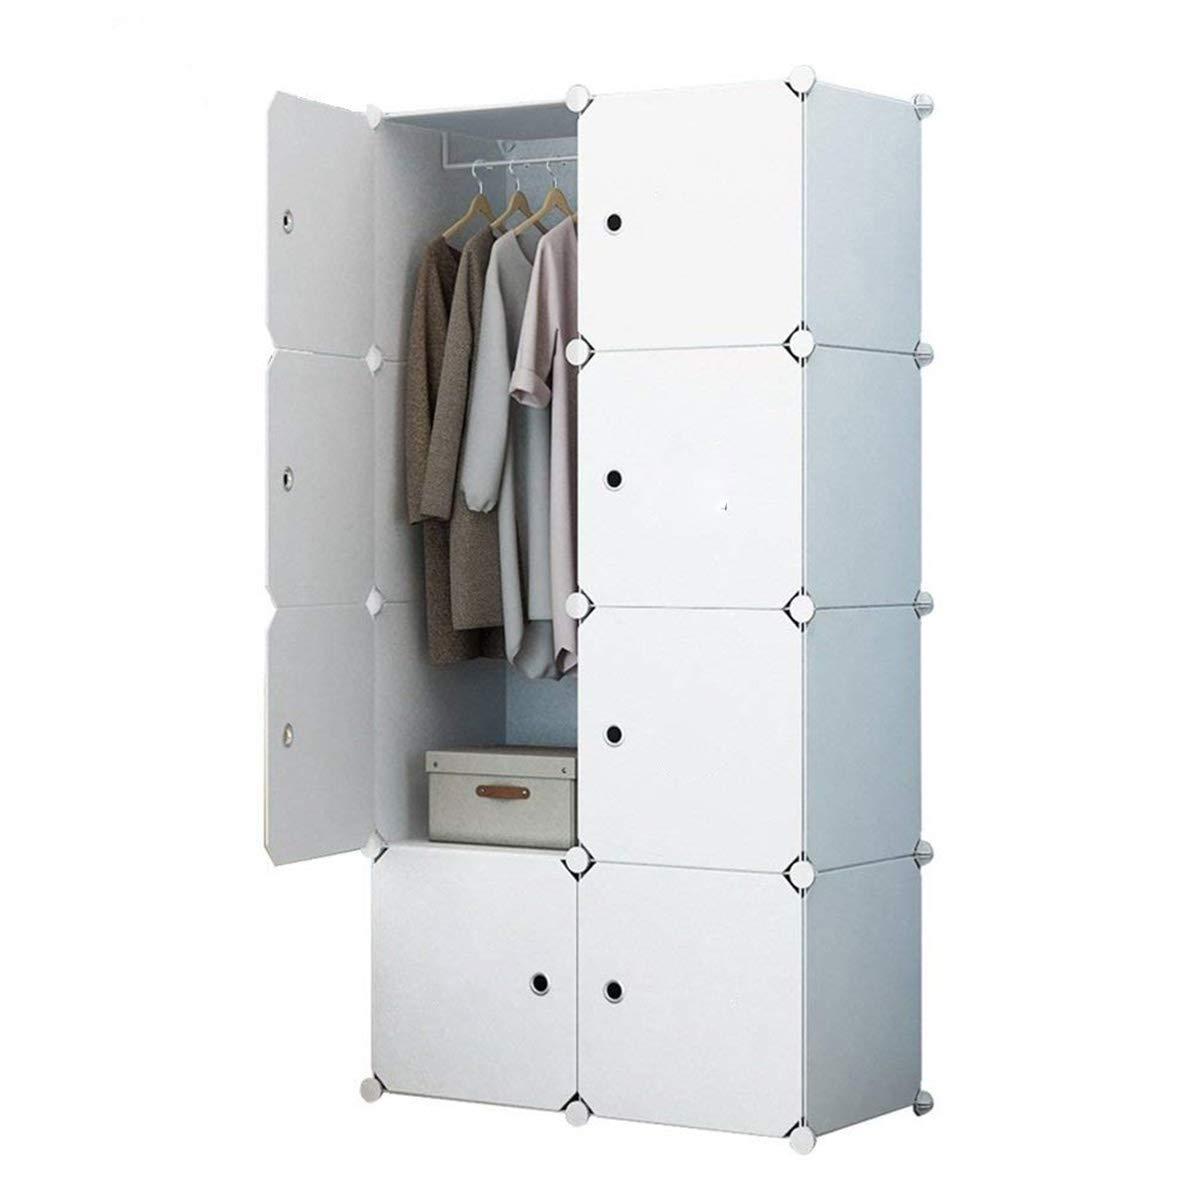 KOUSI Portable Clothes Closet Wardrobe Bedroom Armoire Dresser Cube Storage Organizer, Capacious & Customizable, White, 10 Cubes & 2 Hanging Clothes